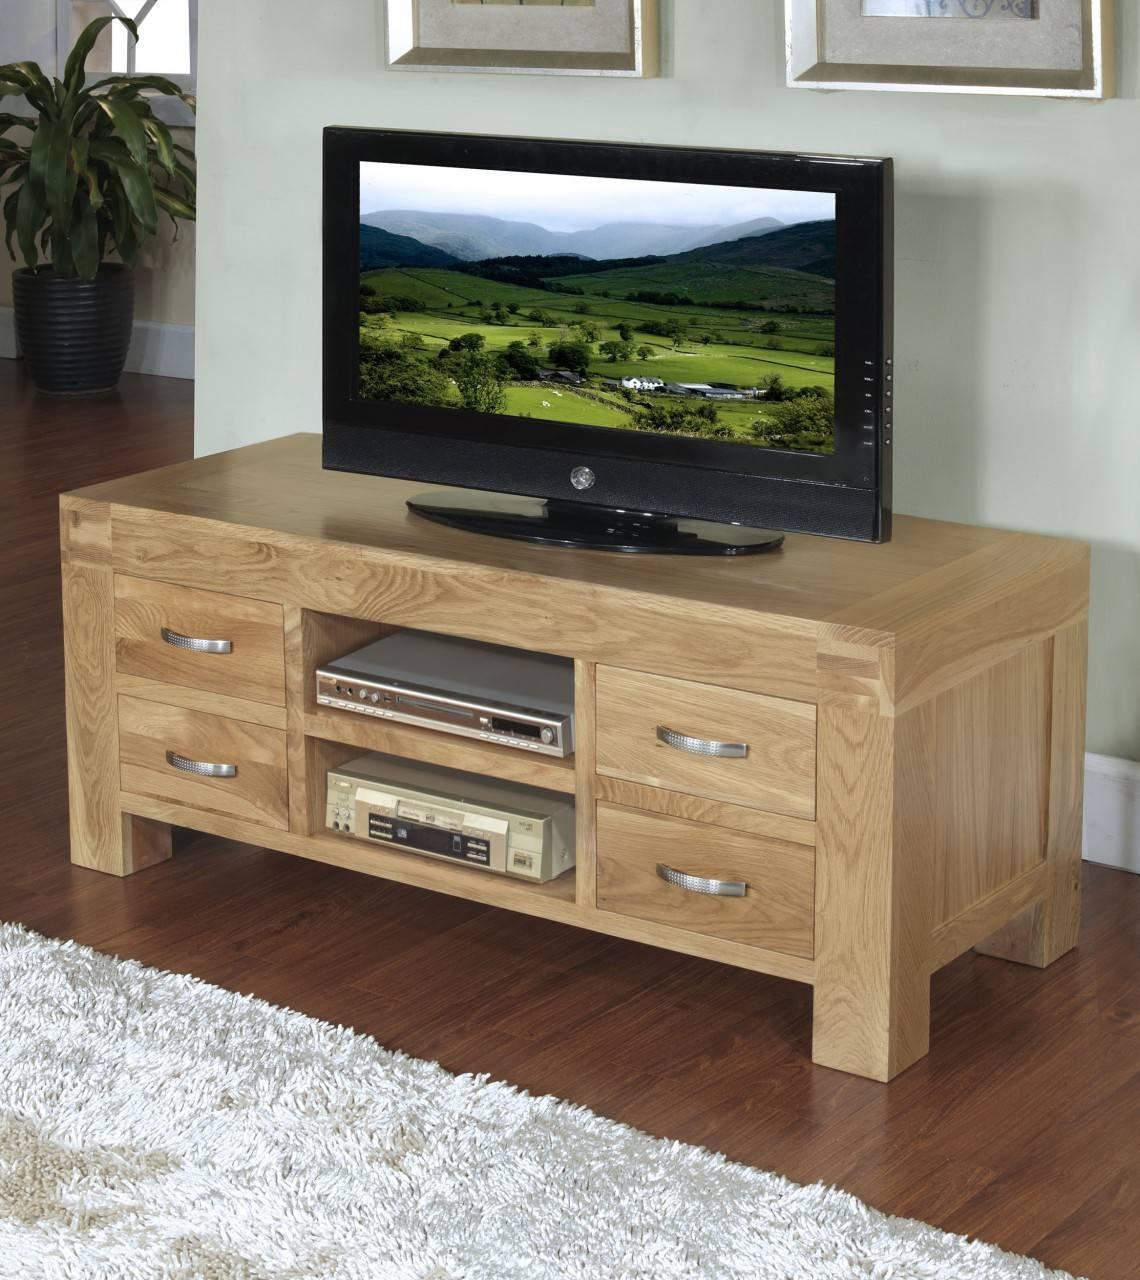 Rivermead Solid Oak Modern Furniture Widescreen Tv Cabinet Stand inside Rustic Oak Tv Stands (Image 9 of 15)